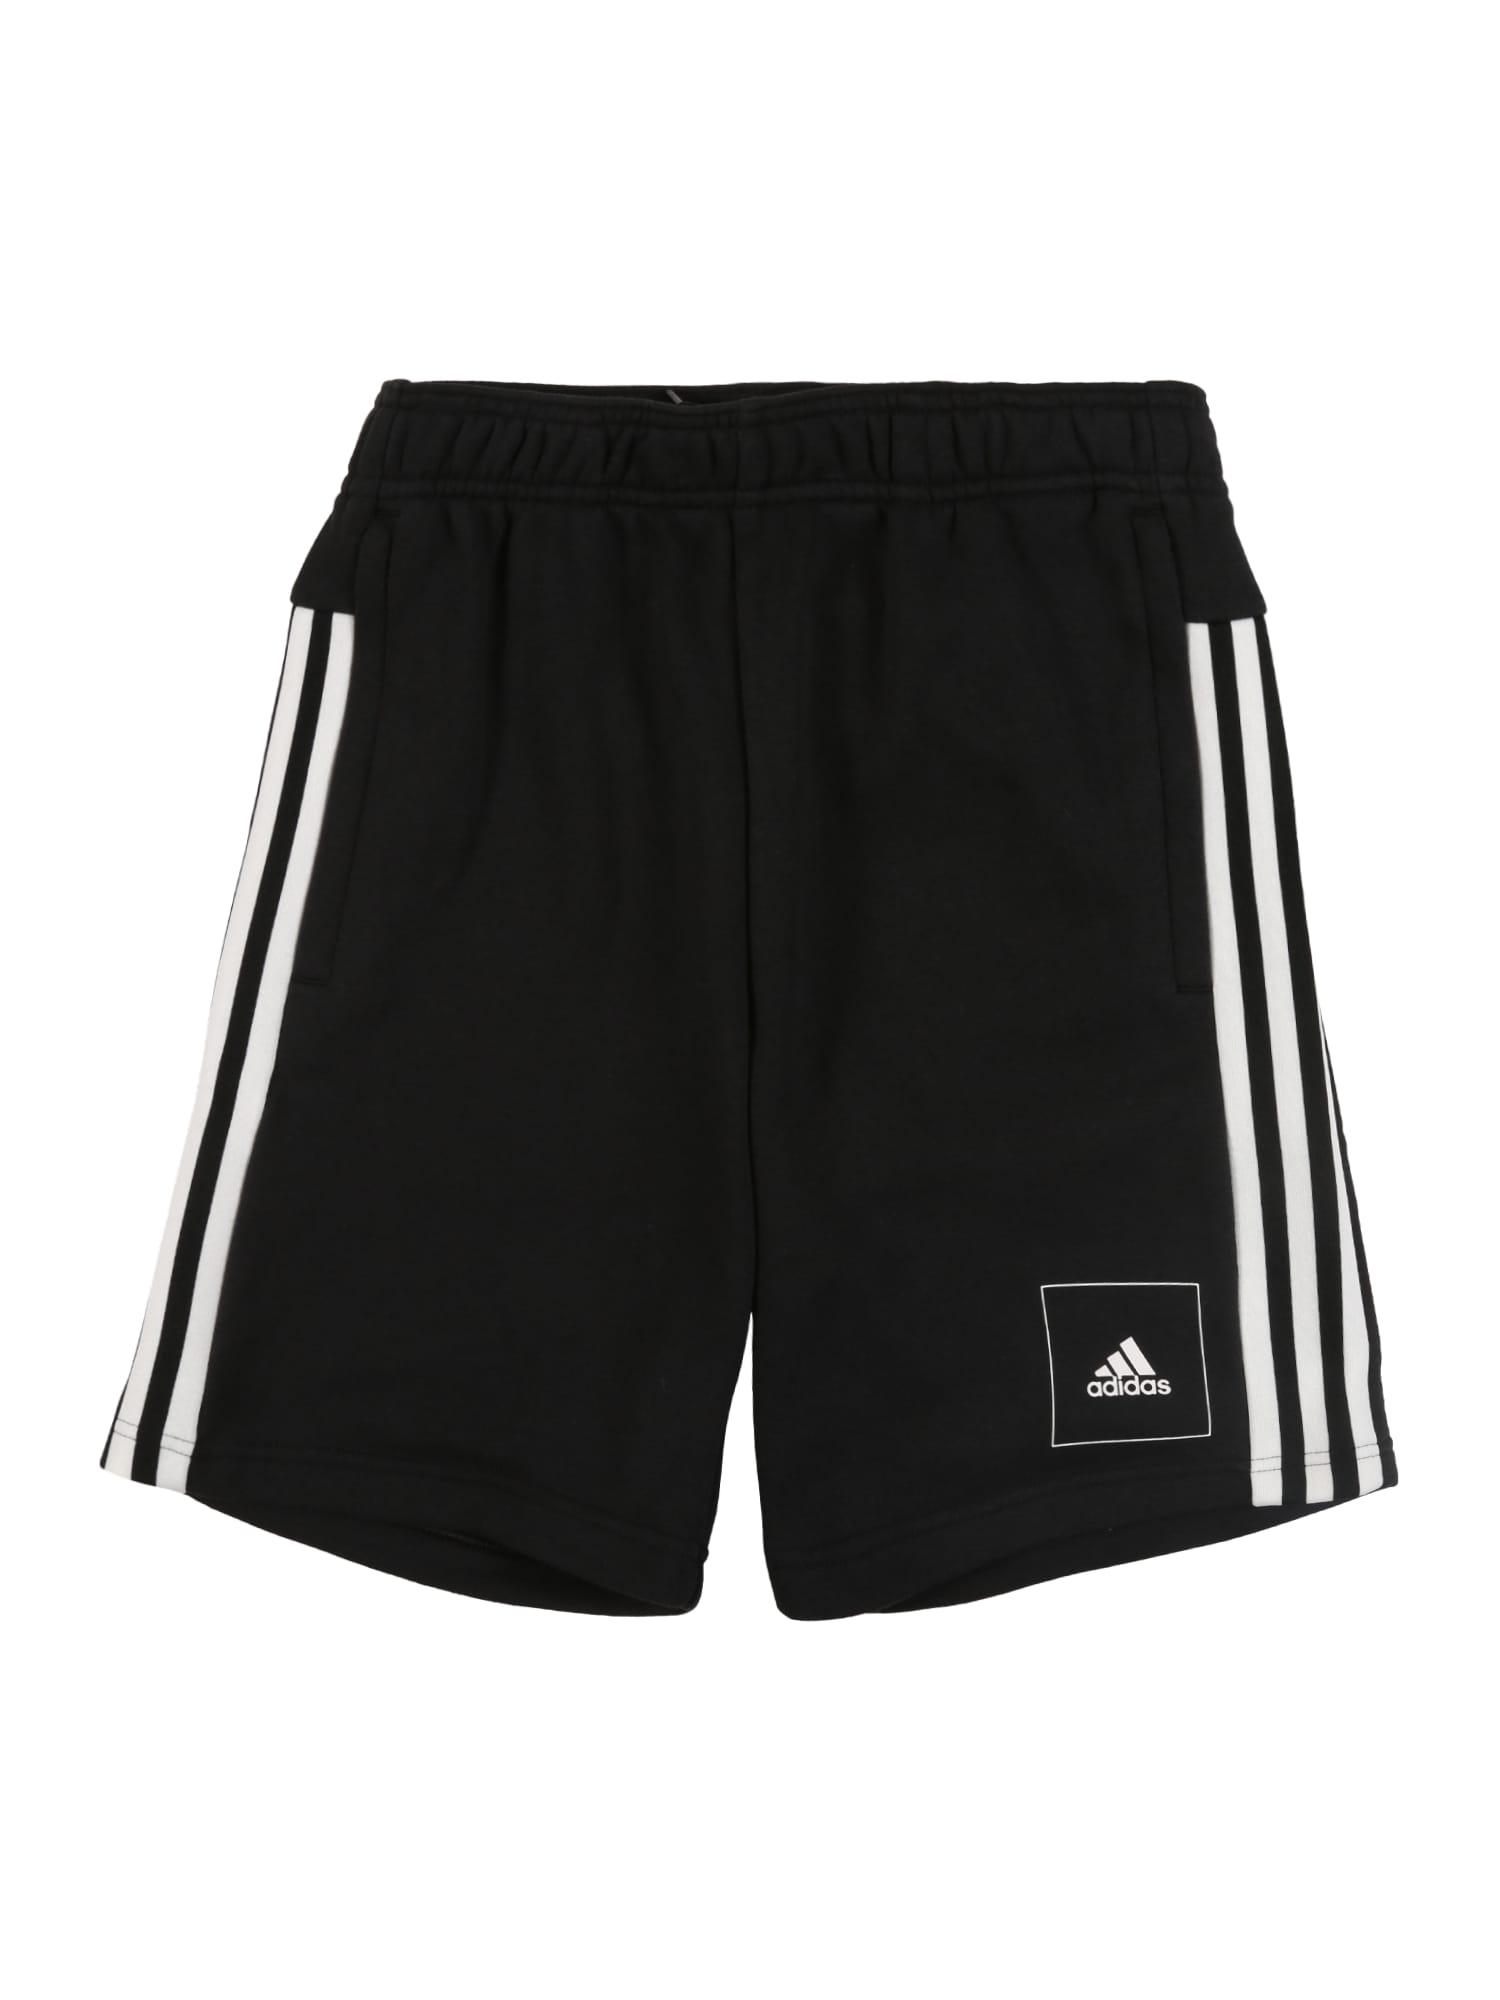 ADIDAS PERFORMANCE Sportinės kelnės 'JB A AAC SHORT' balta / juoda